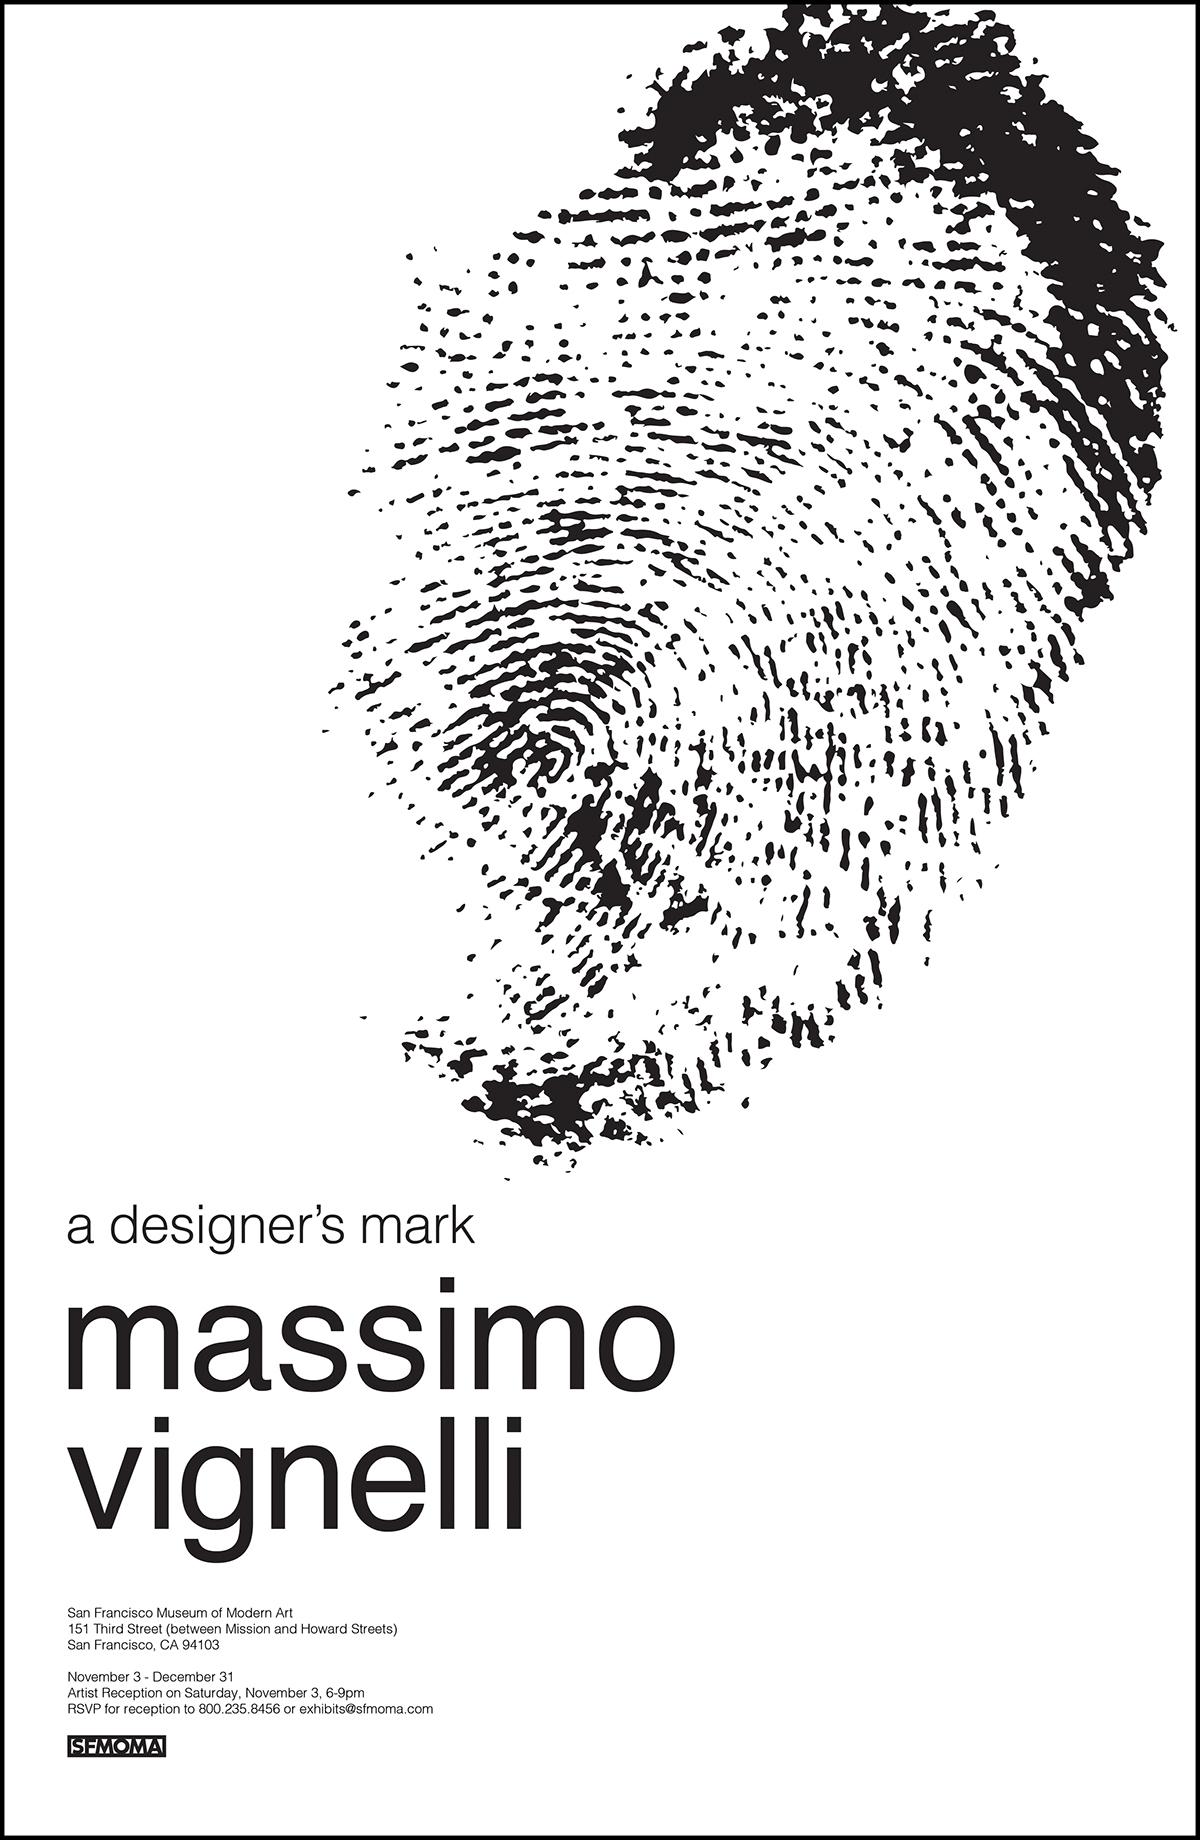 Massimo vignelli poster design modernist modern modernism moma